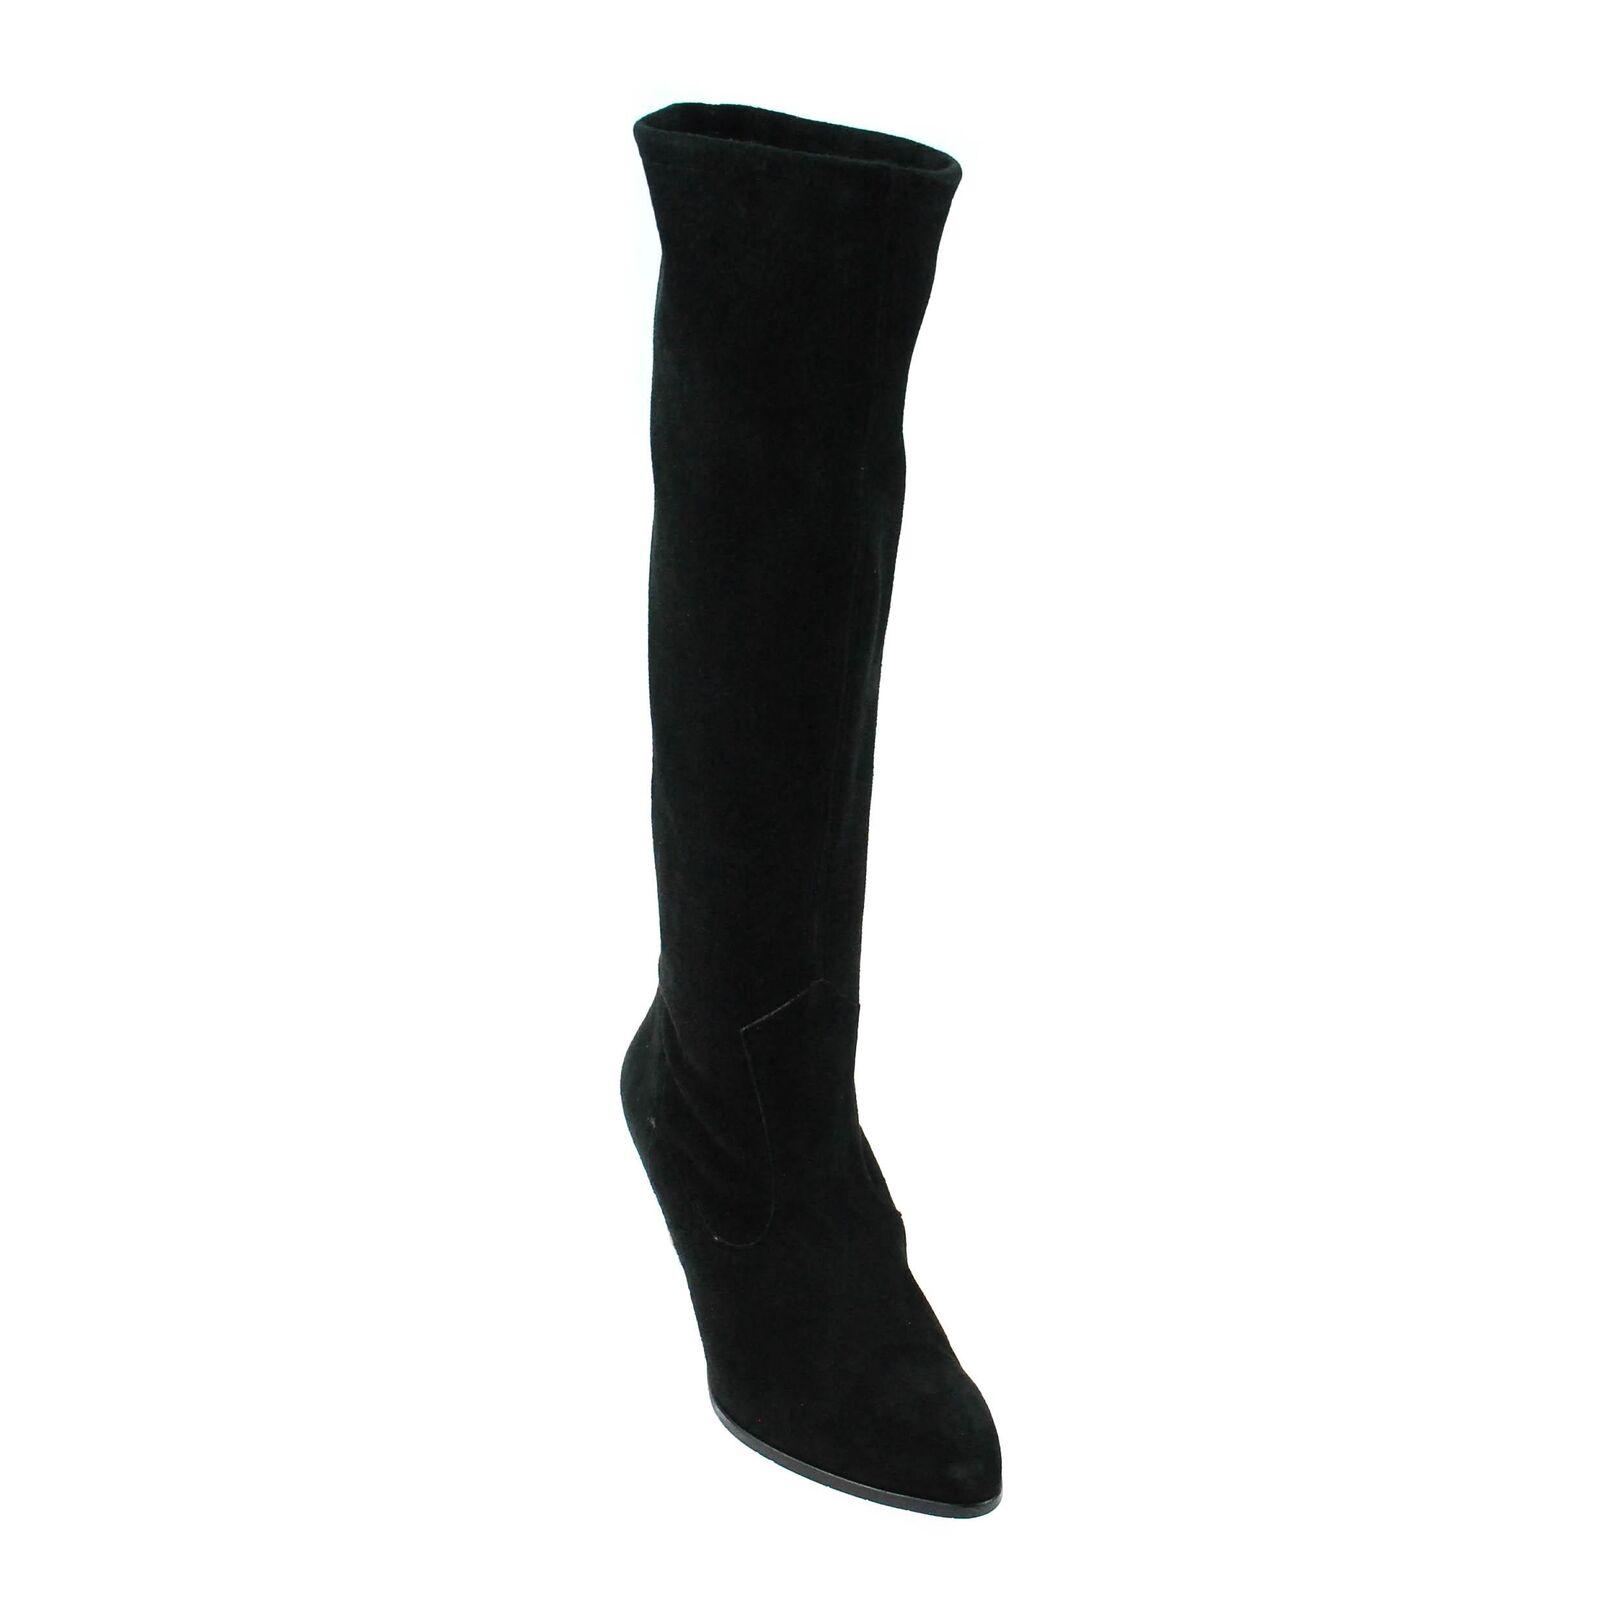 Perlato señora botas botas botas de gamuza negro  Web oficial